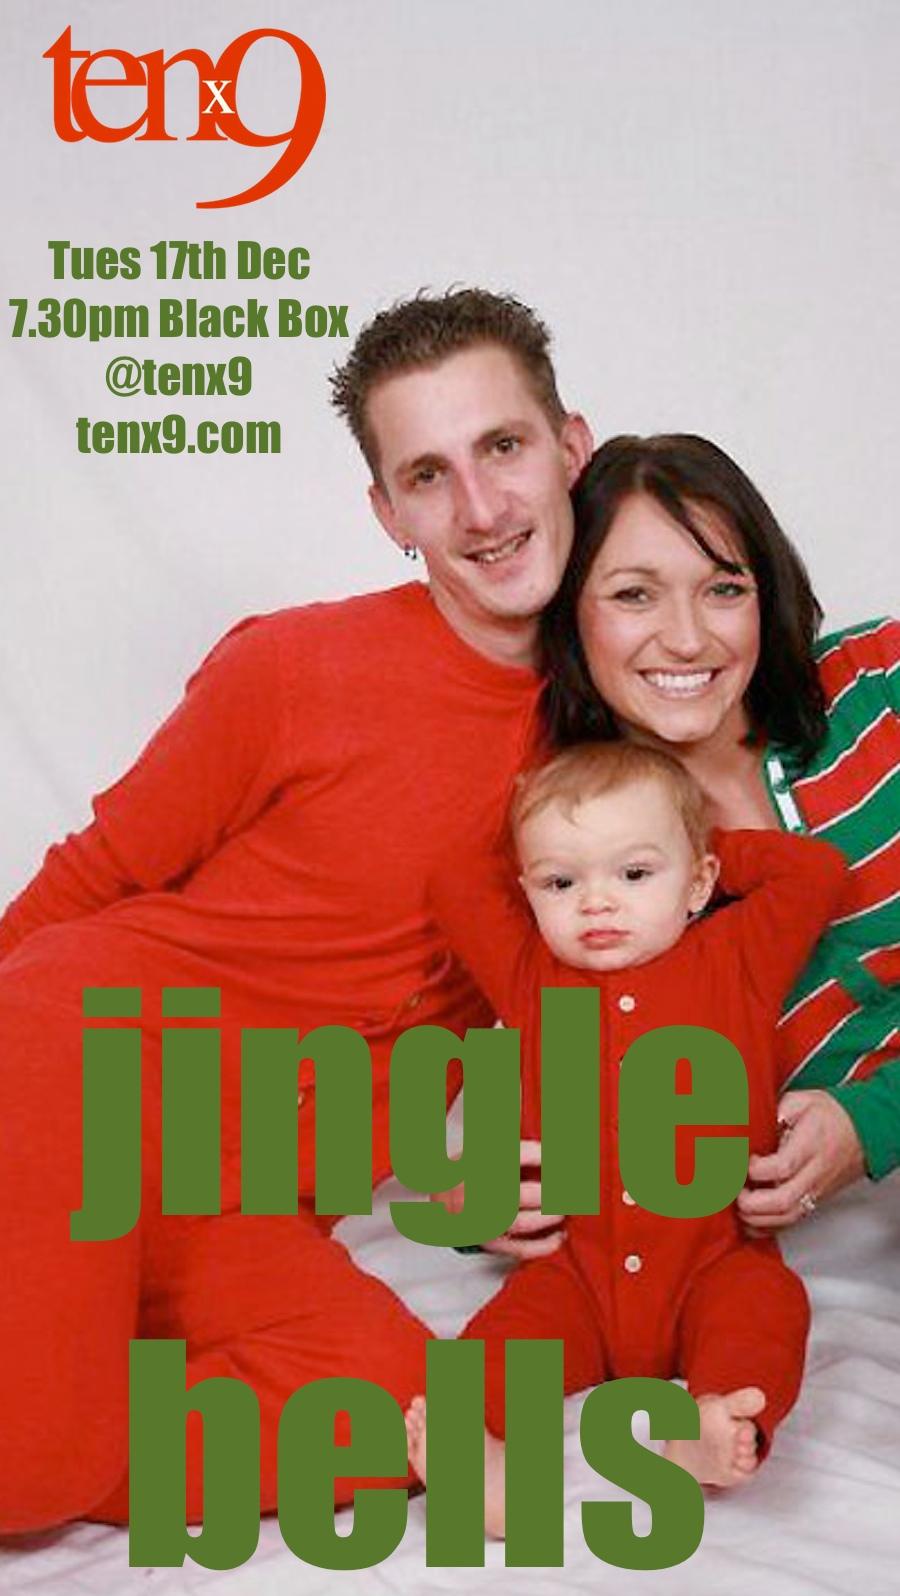 Tenx9 Dec 17th (Tuesday) 7.30pm Black Box Belast. Theme: Jingle Bells